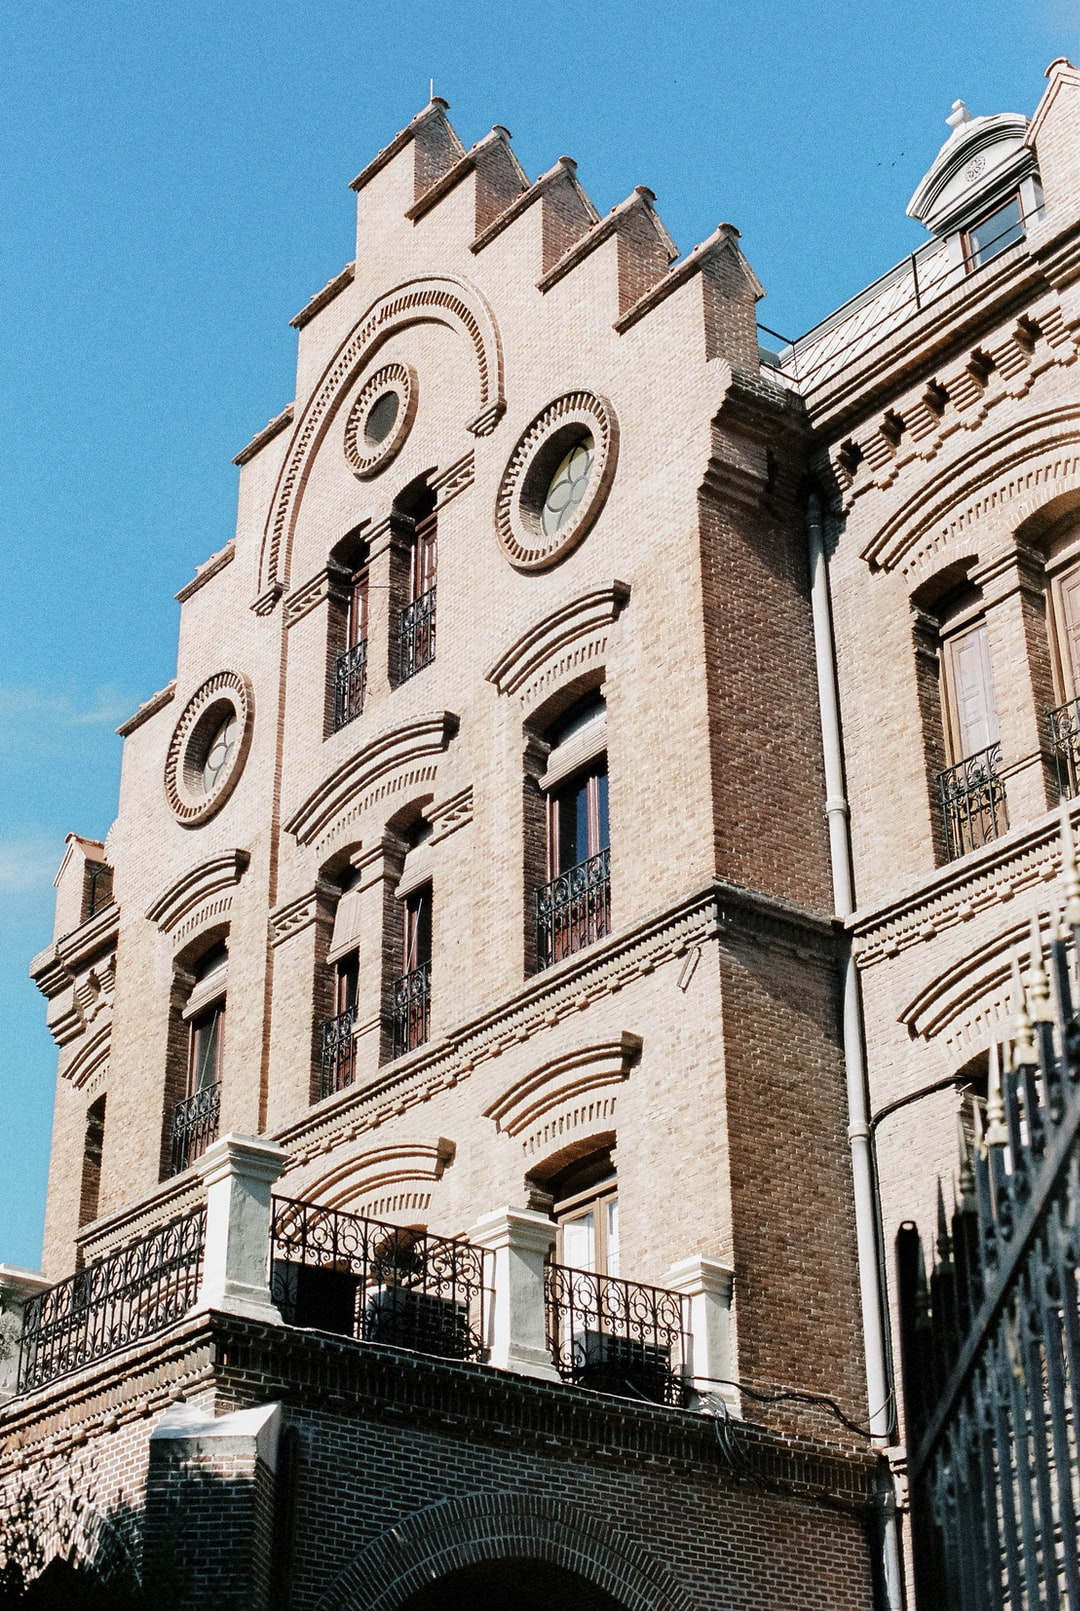 Late XIX school building in Madrid